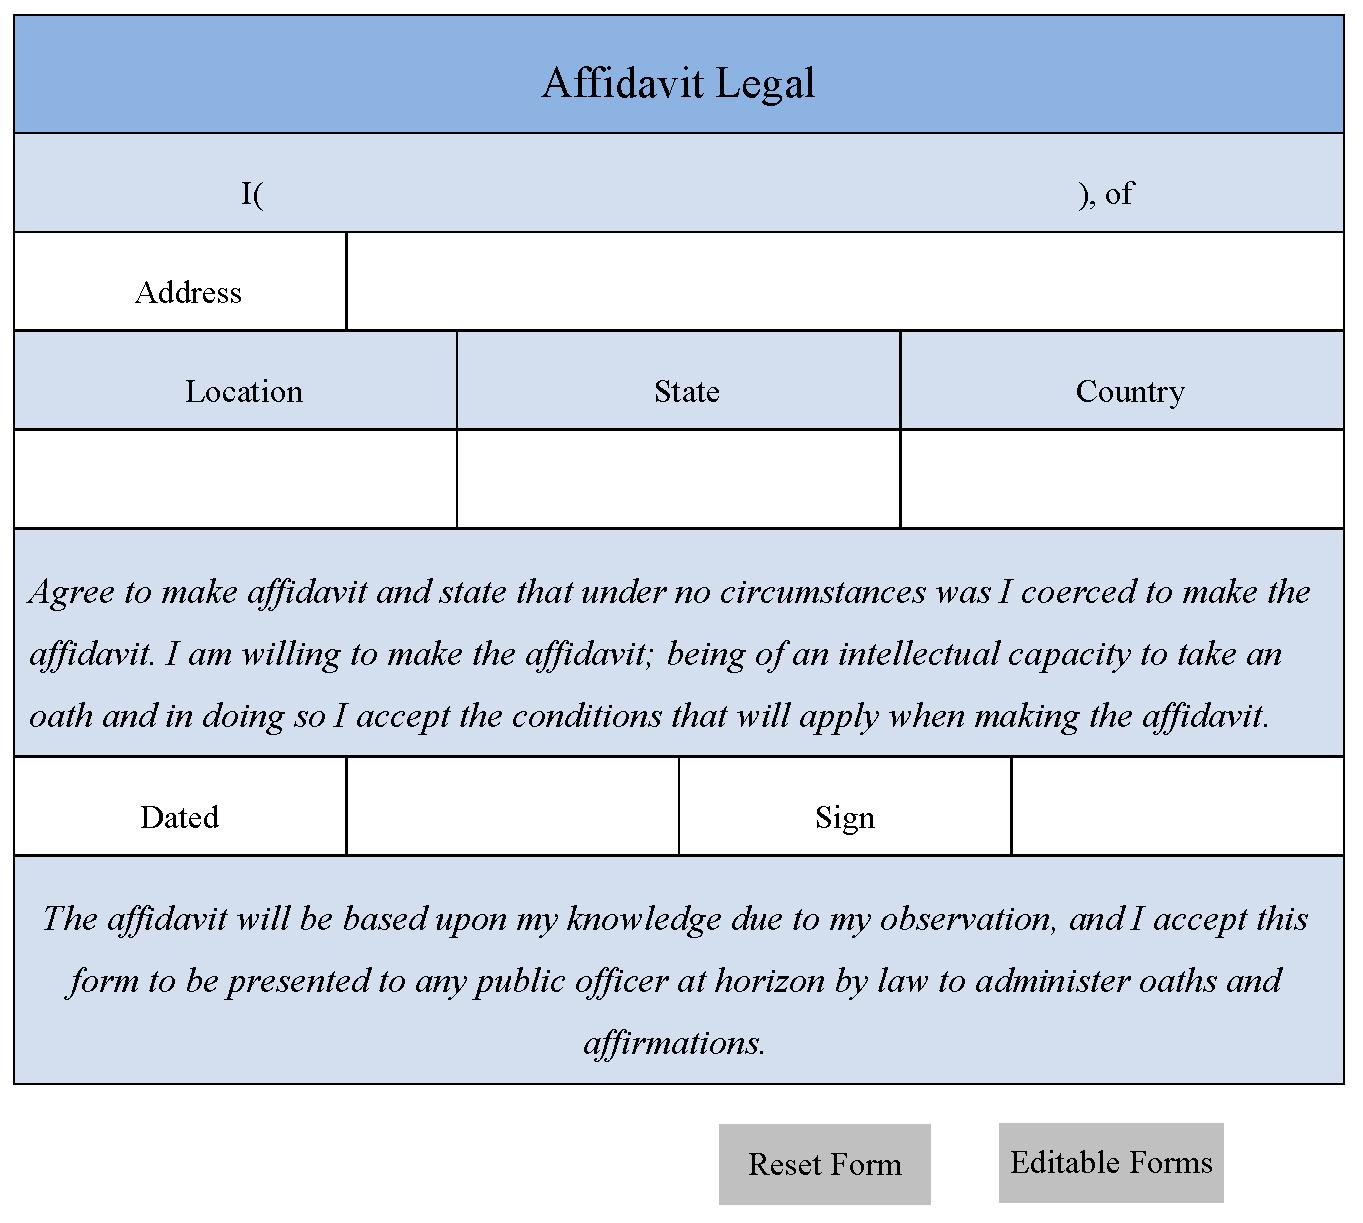 Affidavit Legal Form